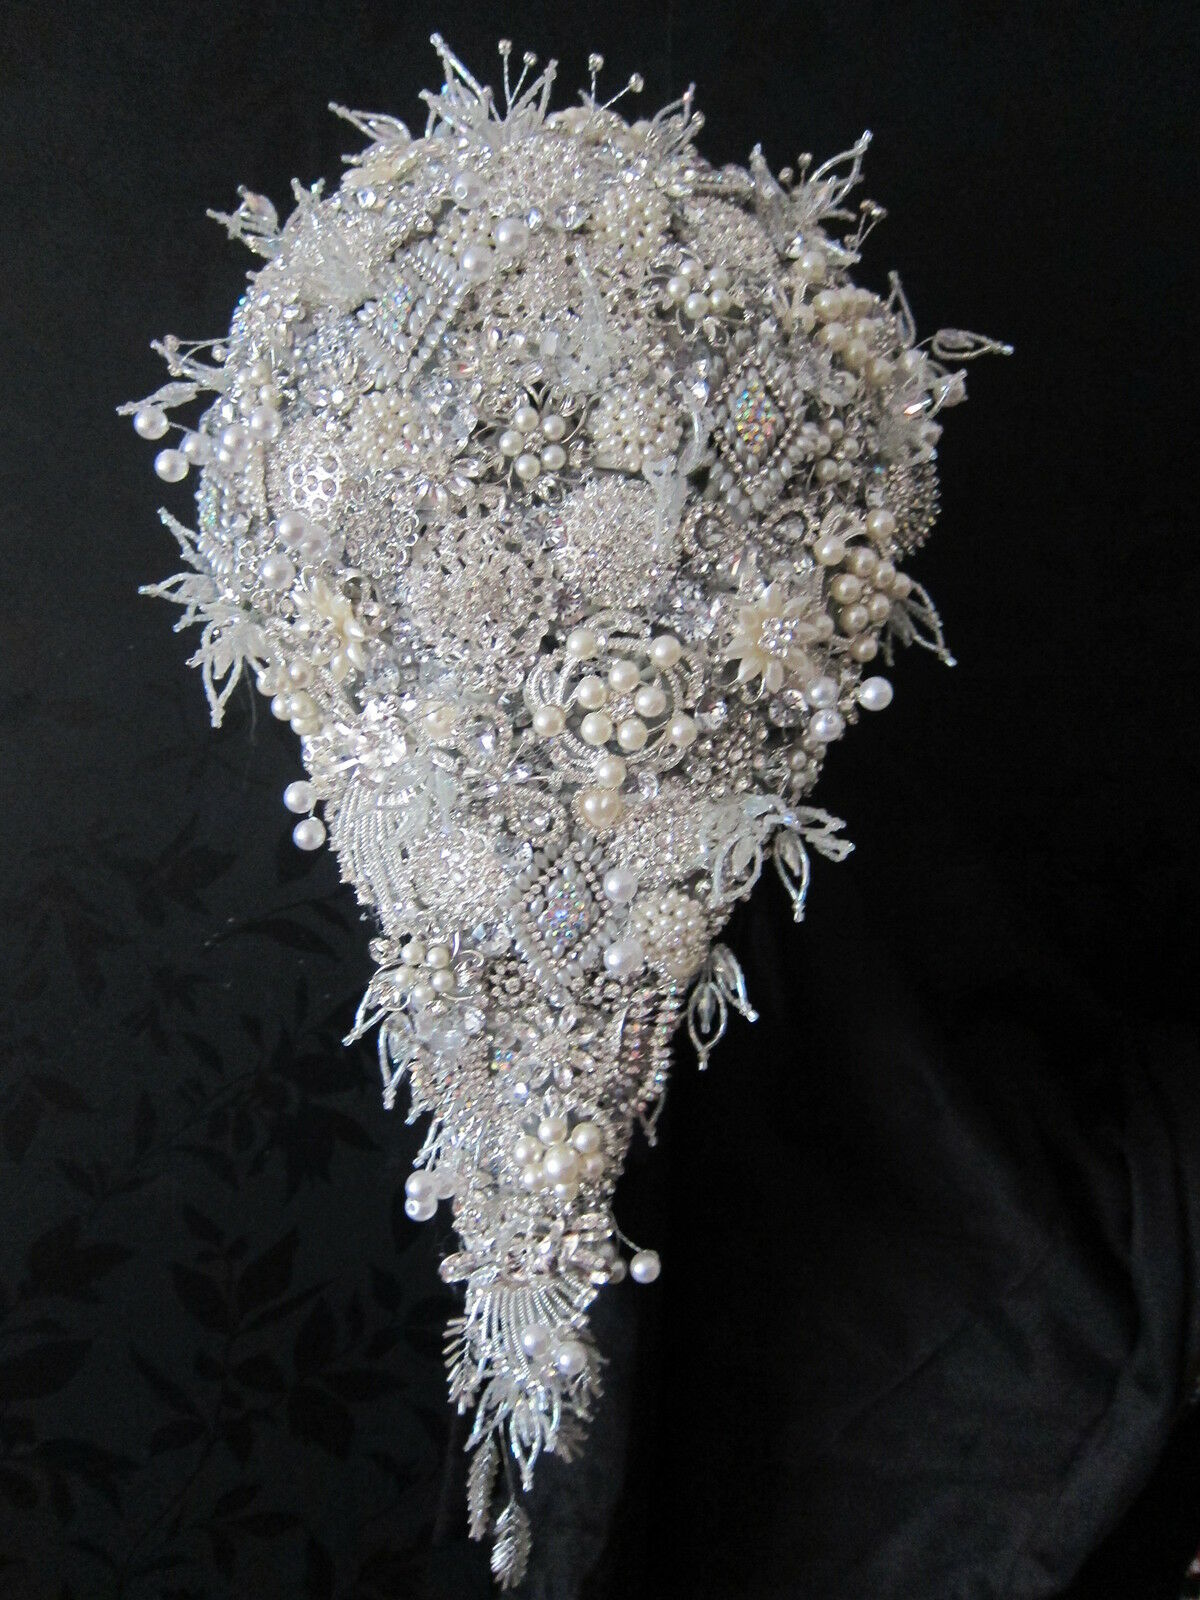 Brides Large Diamante Pearl Brooch Shower Teardrop Bouquet Posy Wedding Flowers